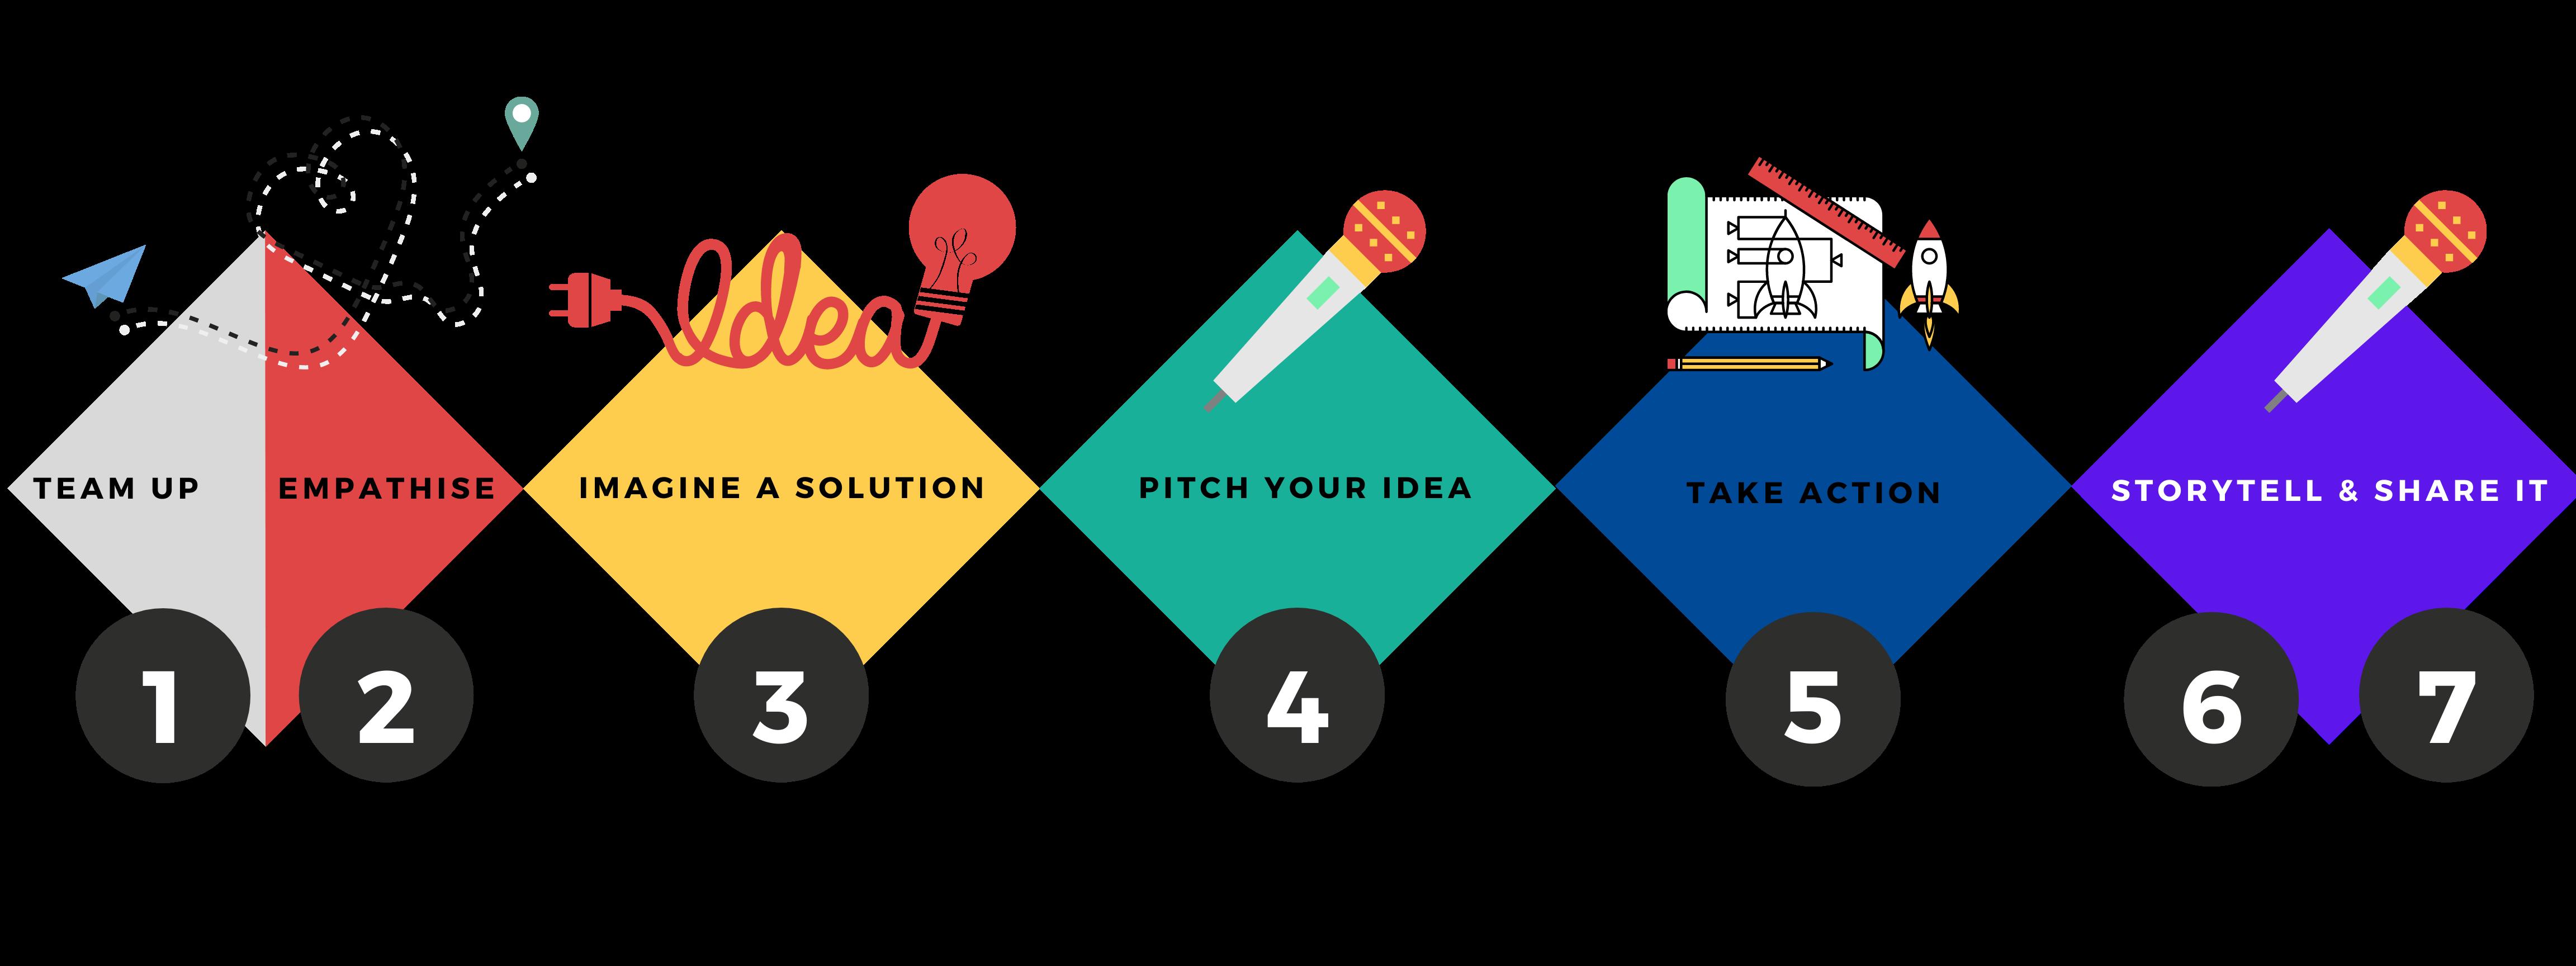 Design Thinking Process Beyond Education